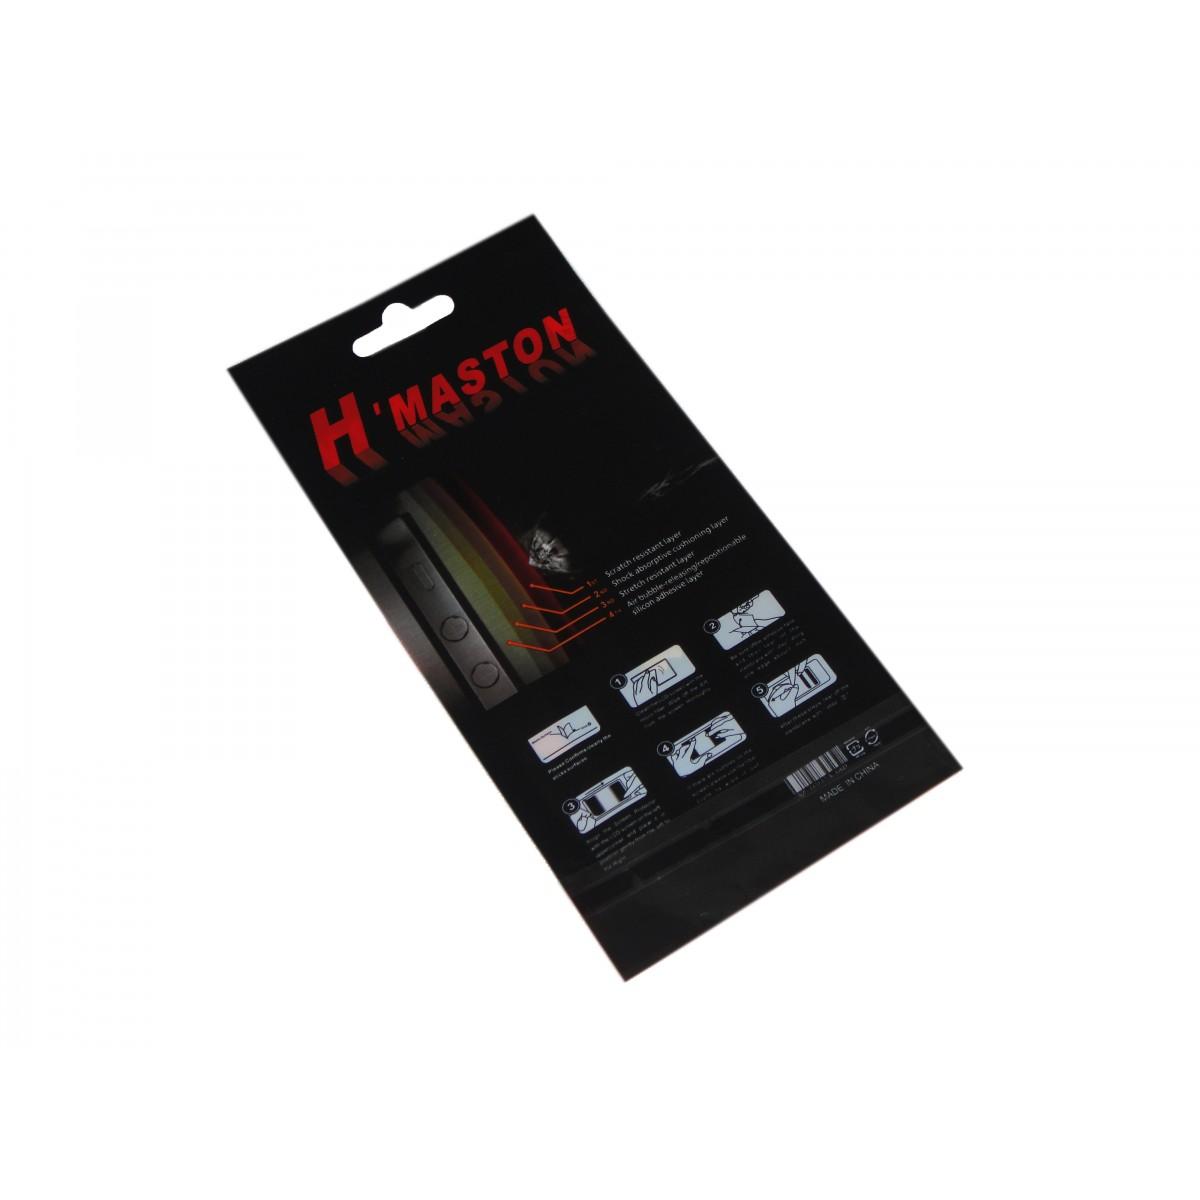 Pelicula Motorola Moto G XT1033 XT1032 Anti Shock Impacto